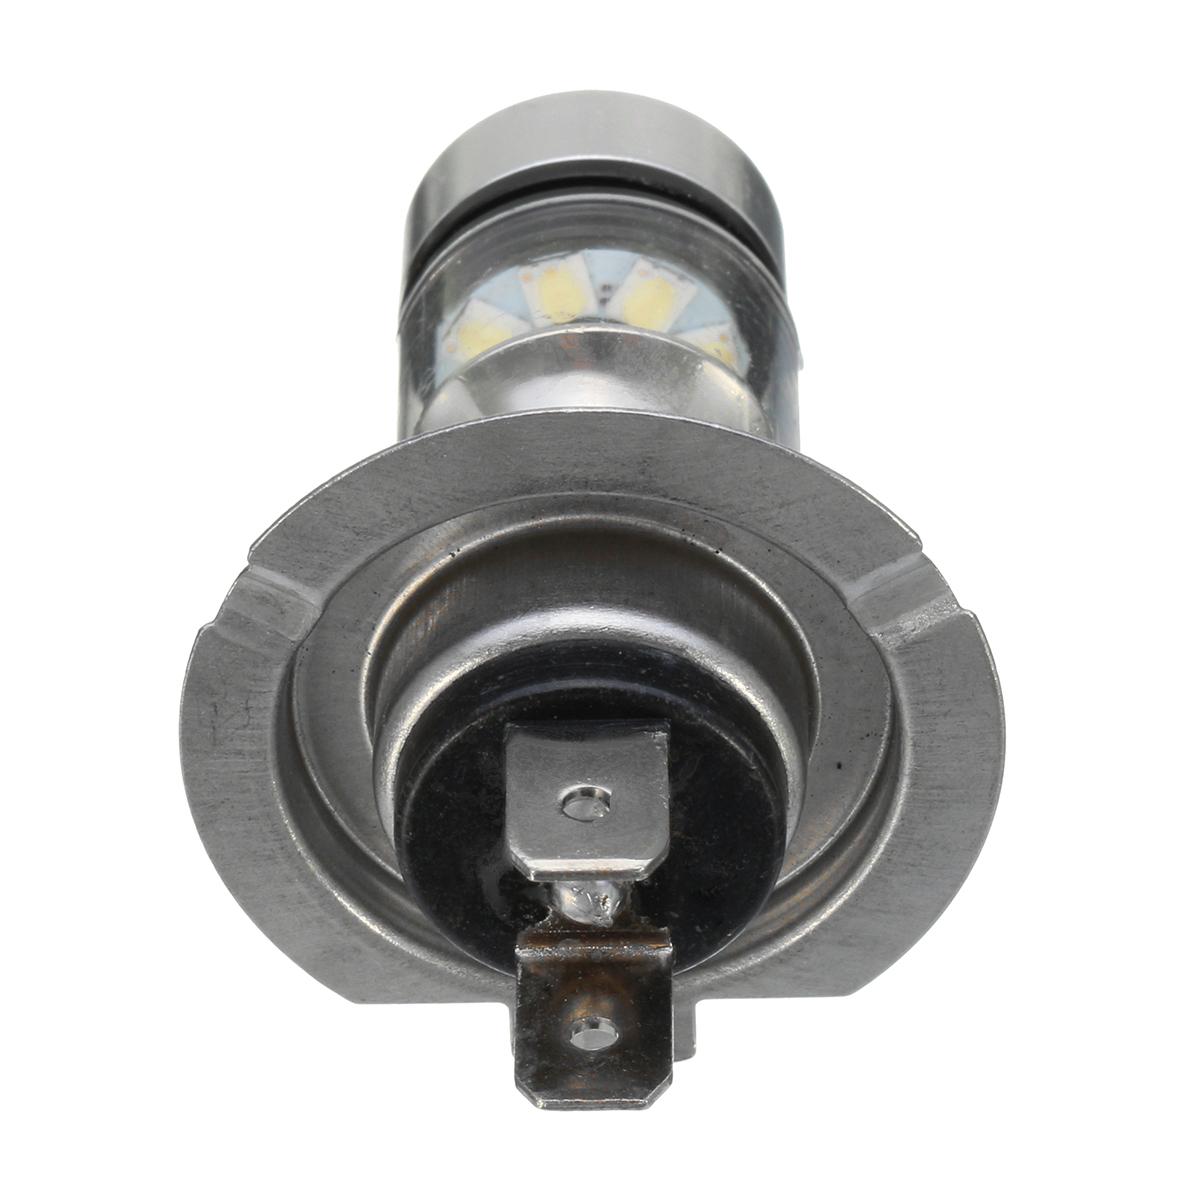 2X 100W 12-24V H7 LED Фары Противотуманные хвостовые ксеноновые лампы - фото 3